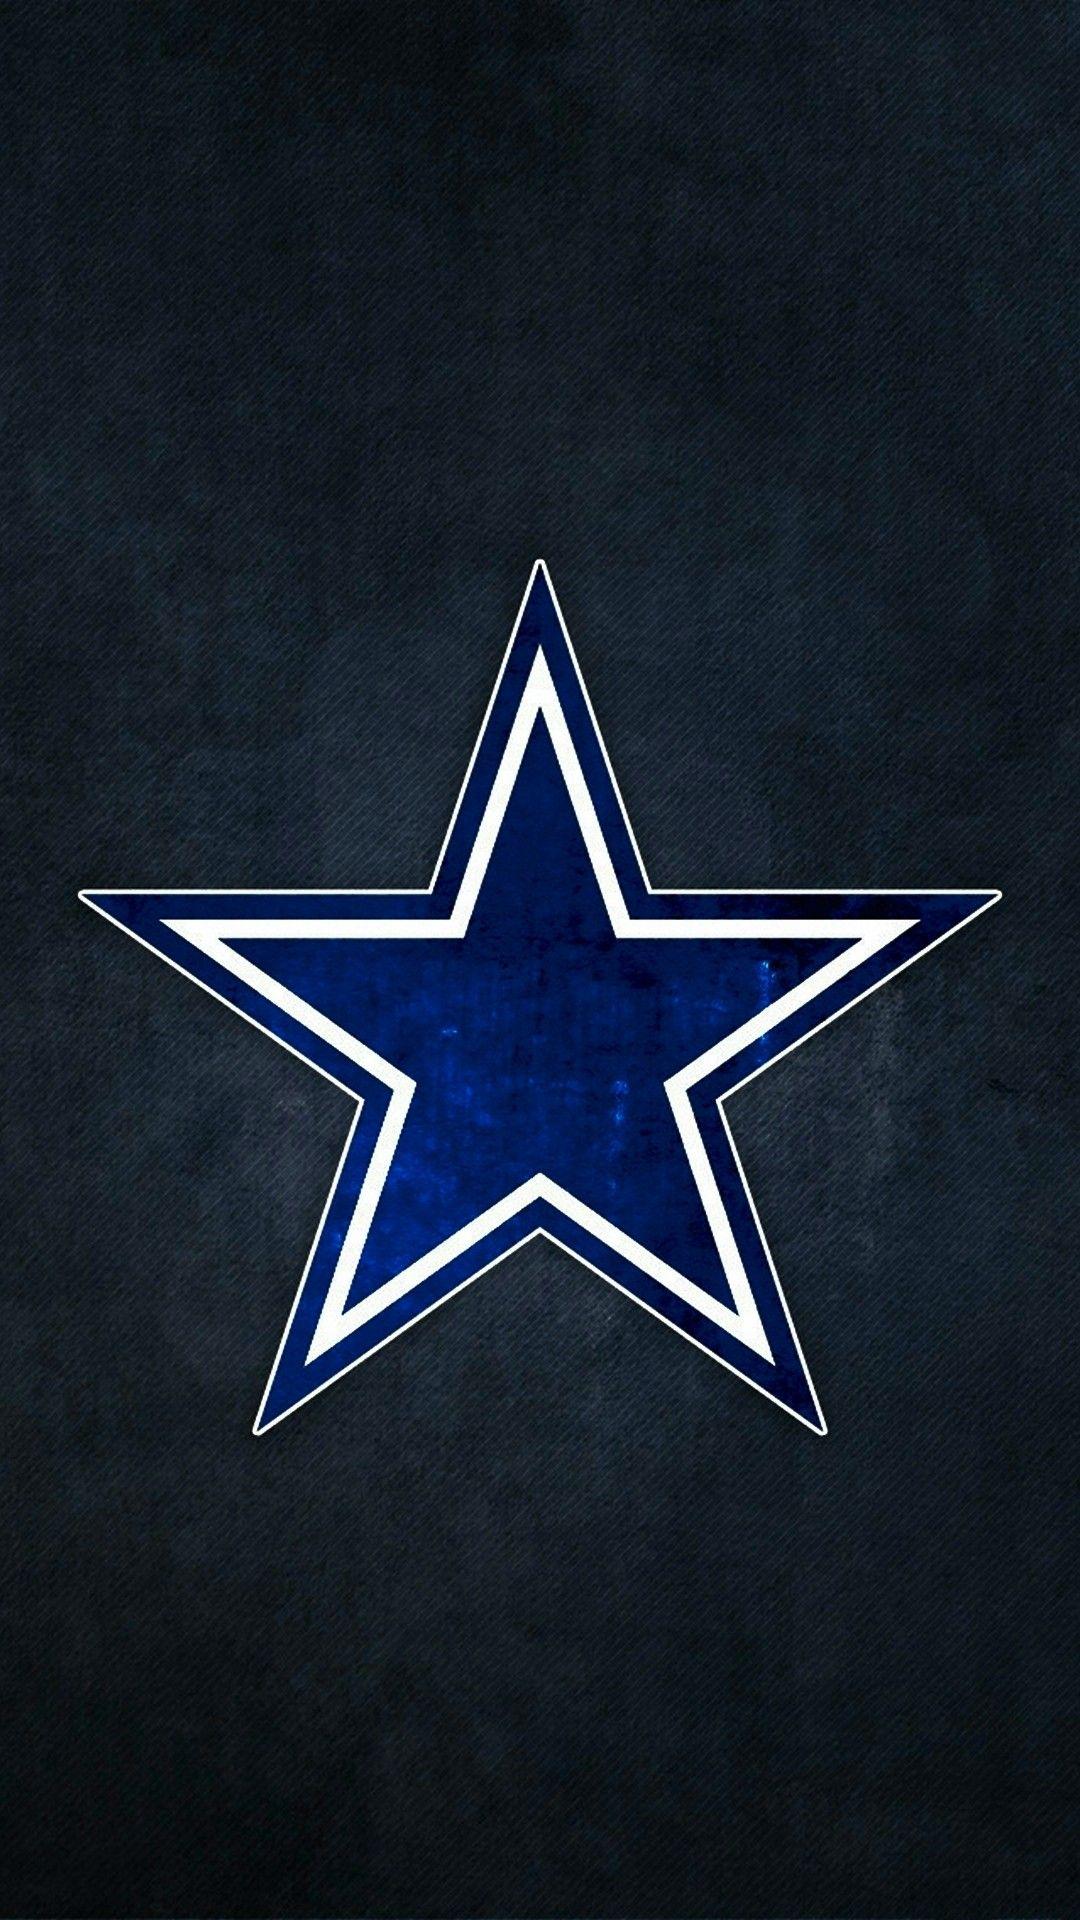 Pin by markxray45 on America's Team Dallas cowboys